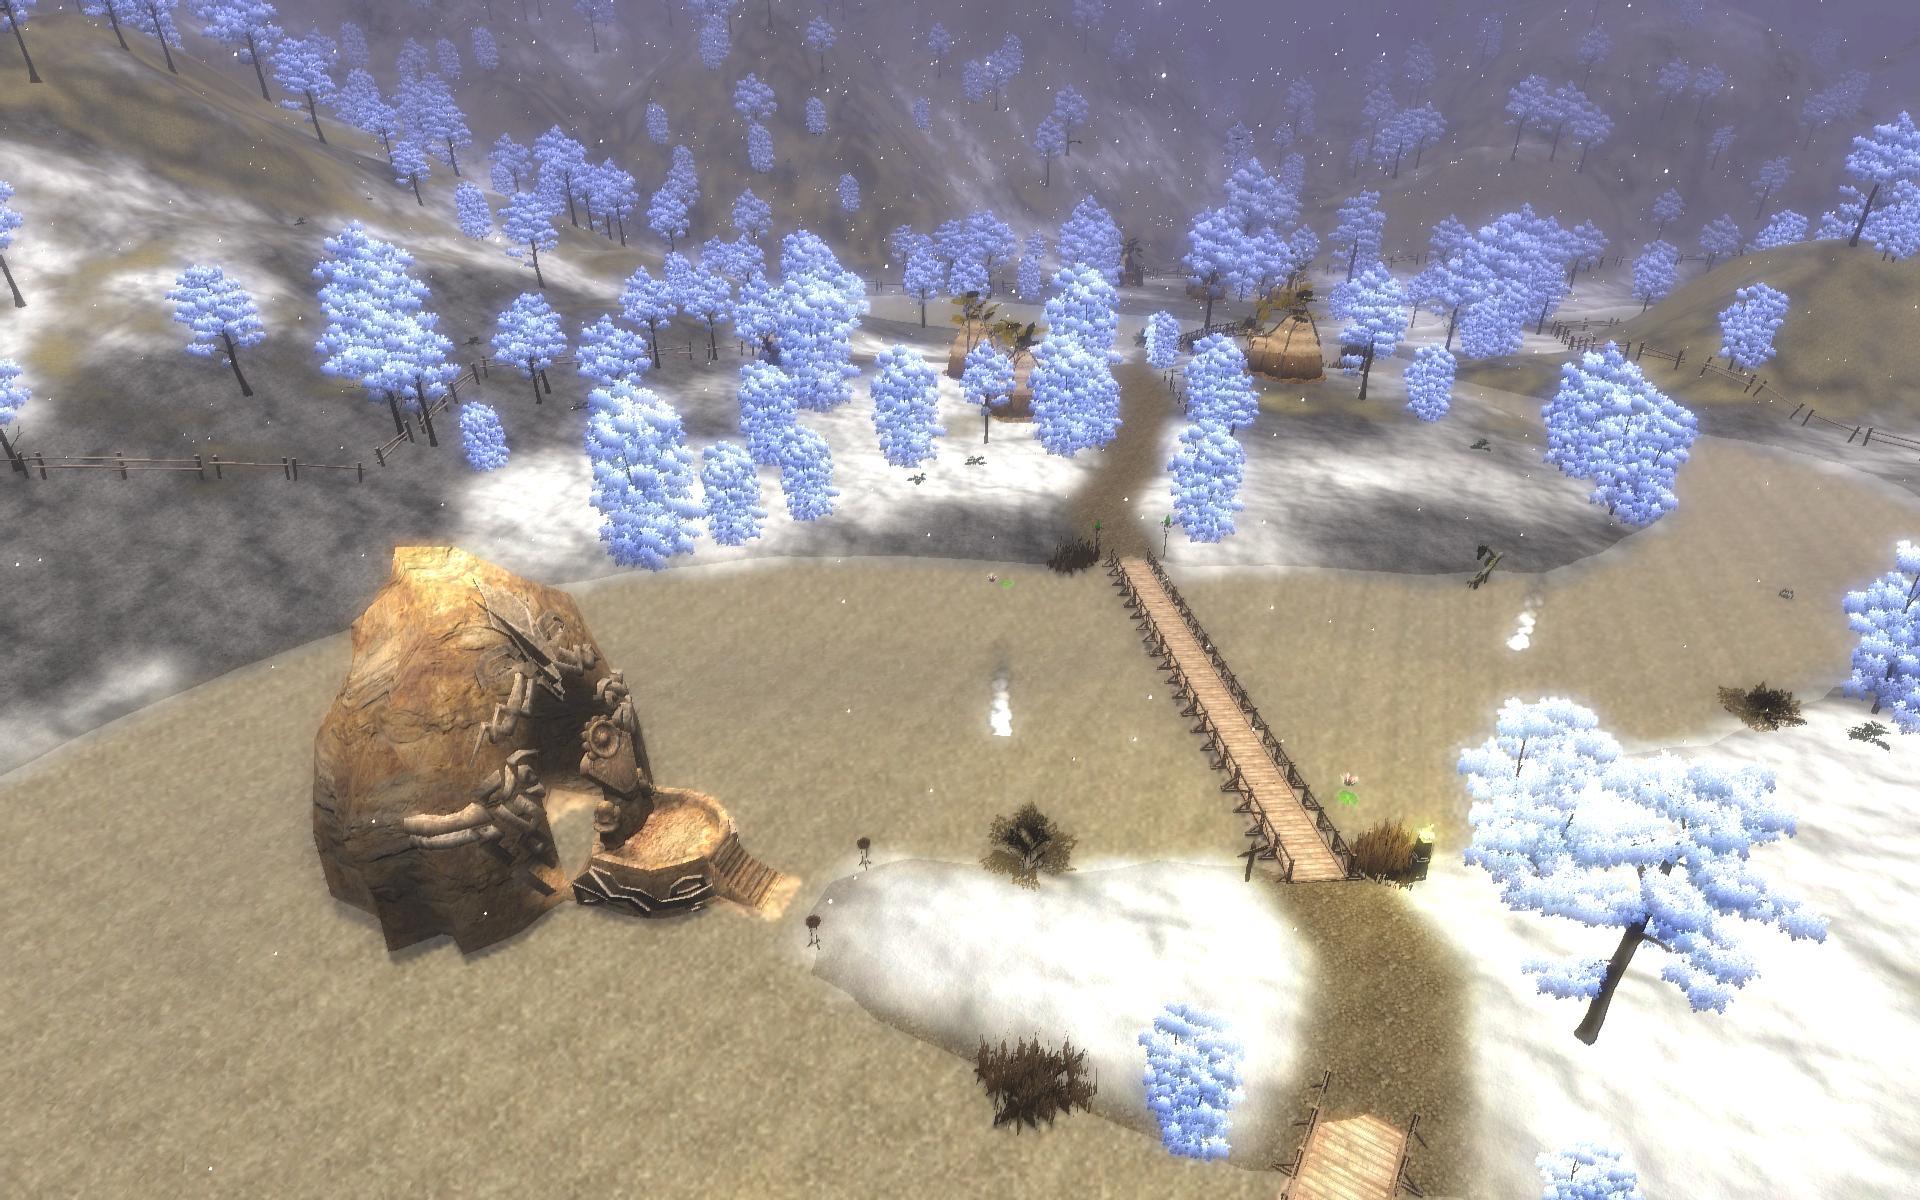 Click image for larger version.Name:CraftOfGods 2010-11-08 23-23-16-82.jpgViews:51Size:331.1 KBID:1442